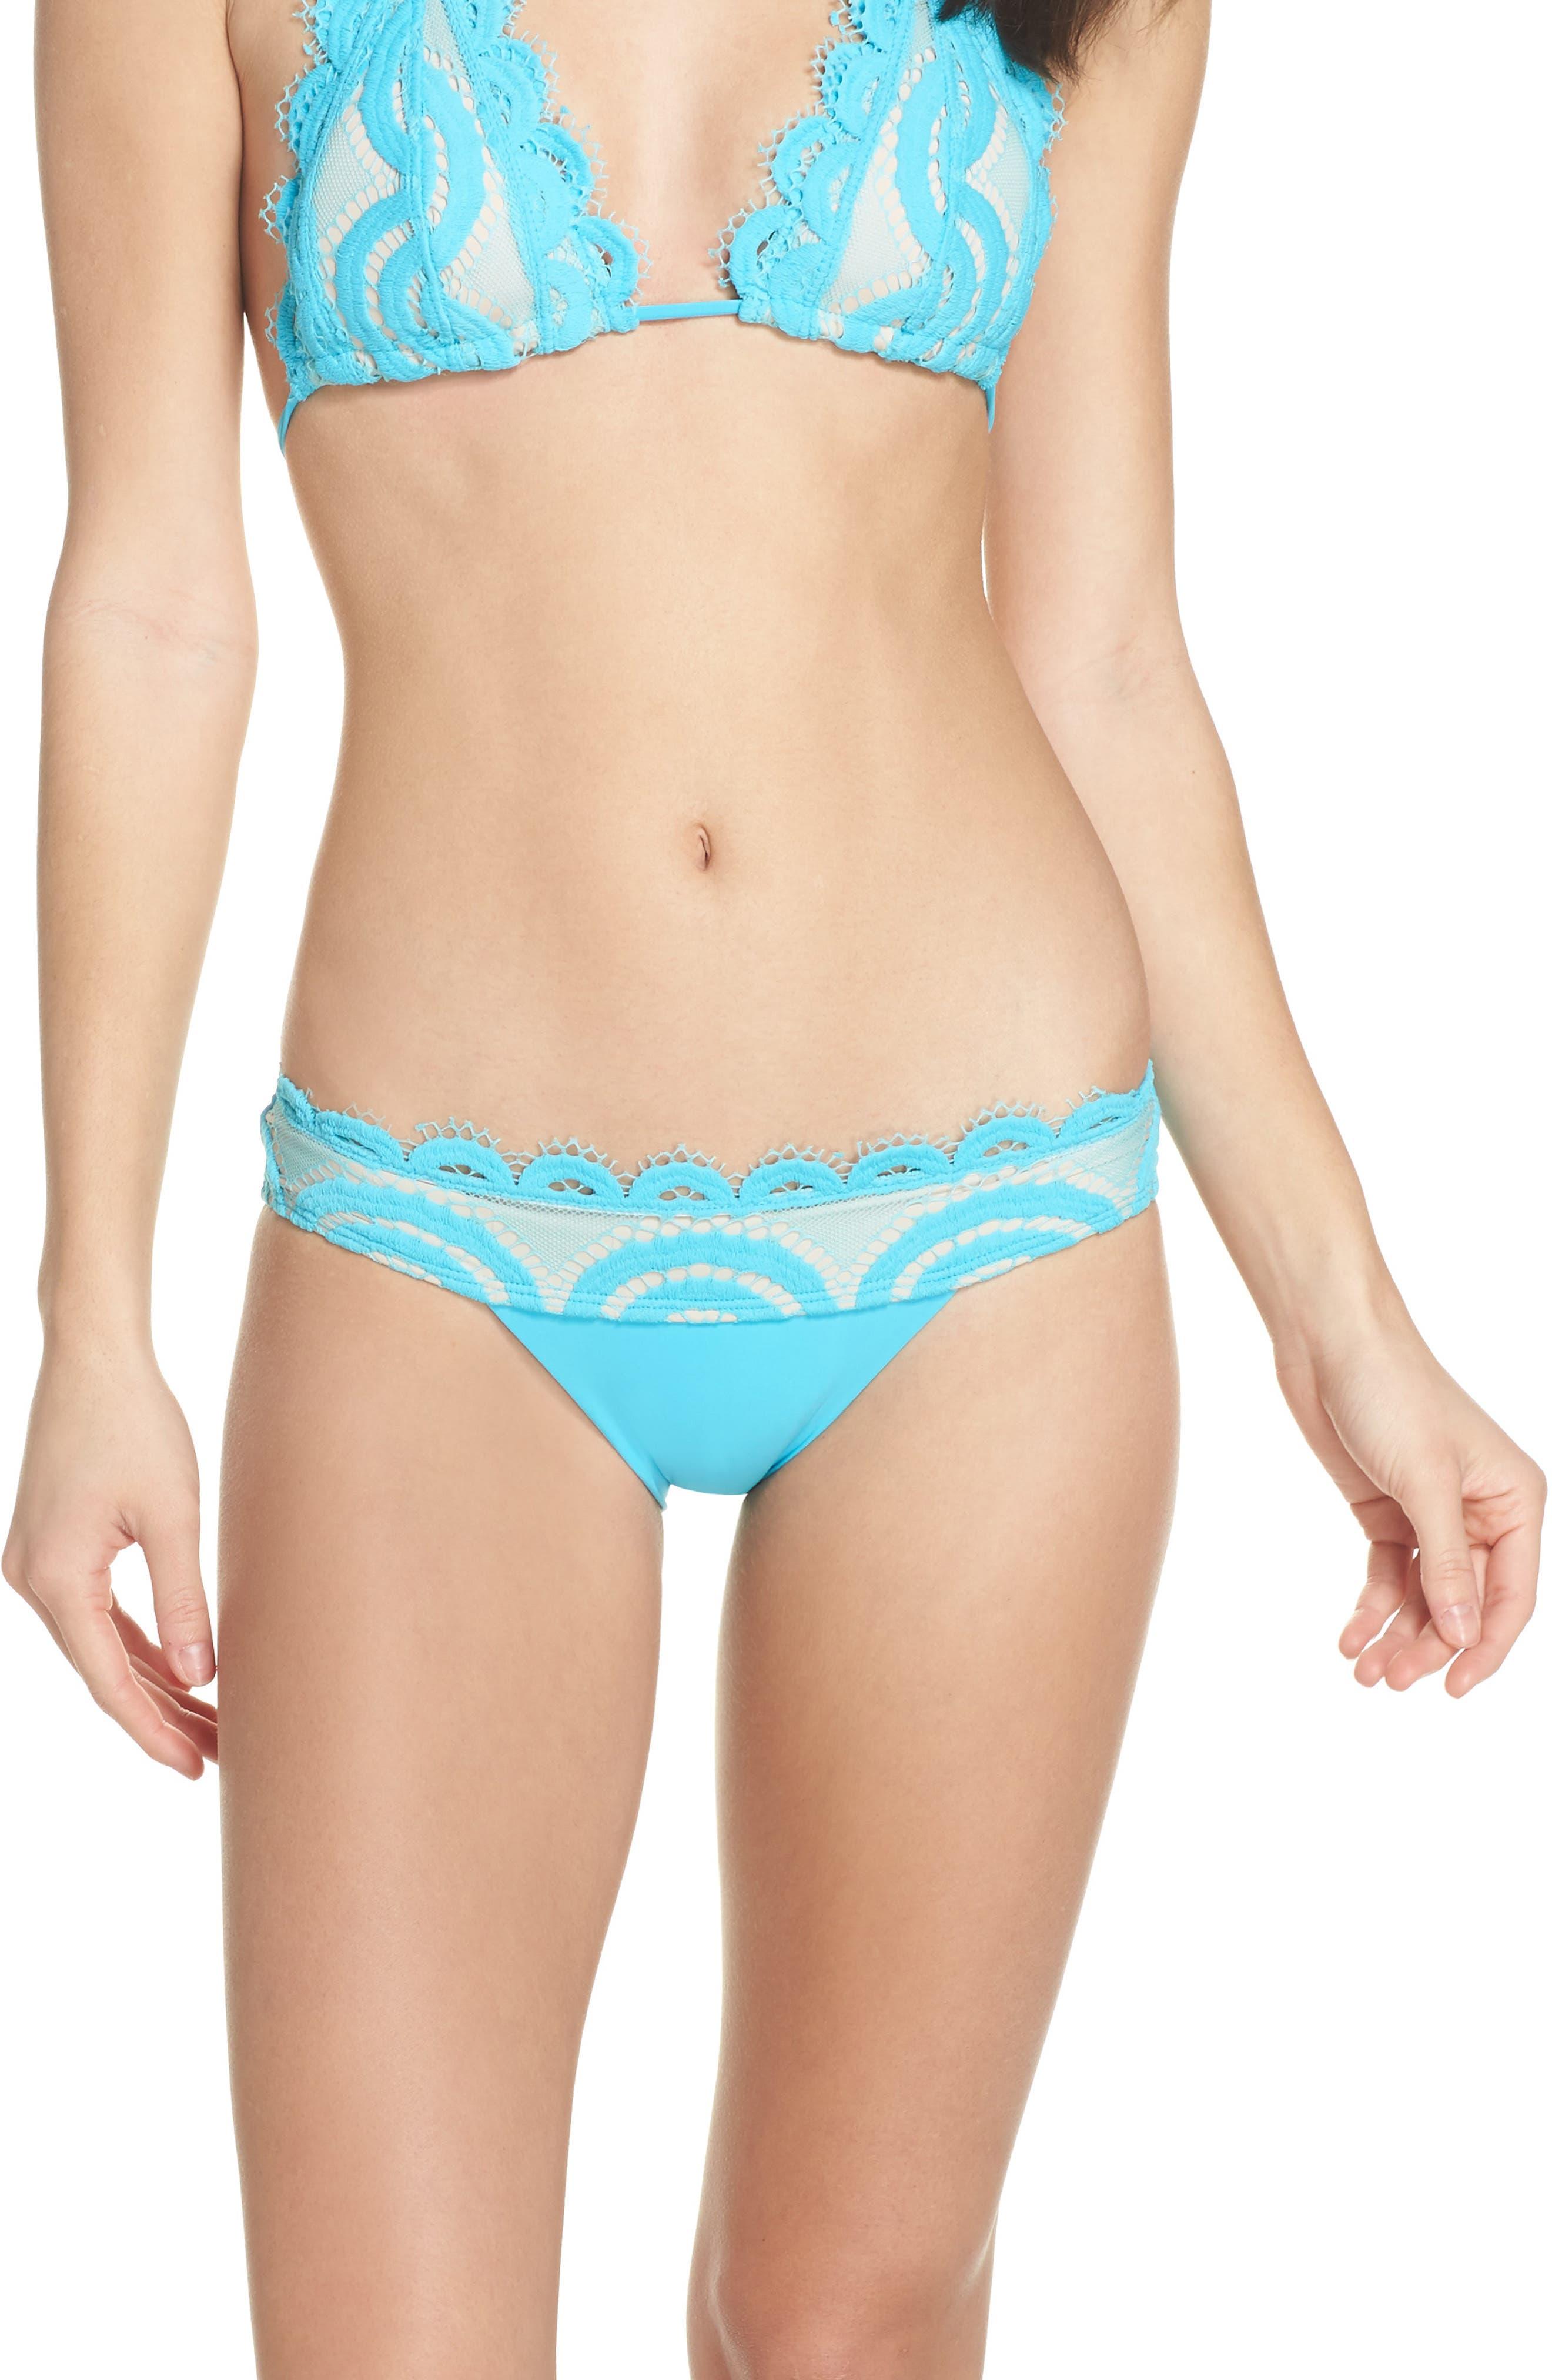 Banded Lace Bikini Bottoms,                             Main thumbnail 1, color,                             415